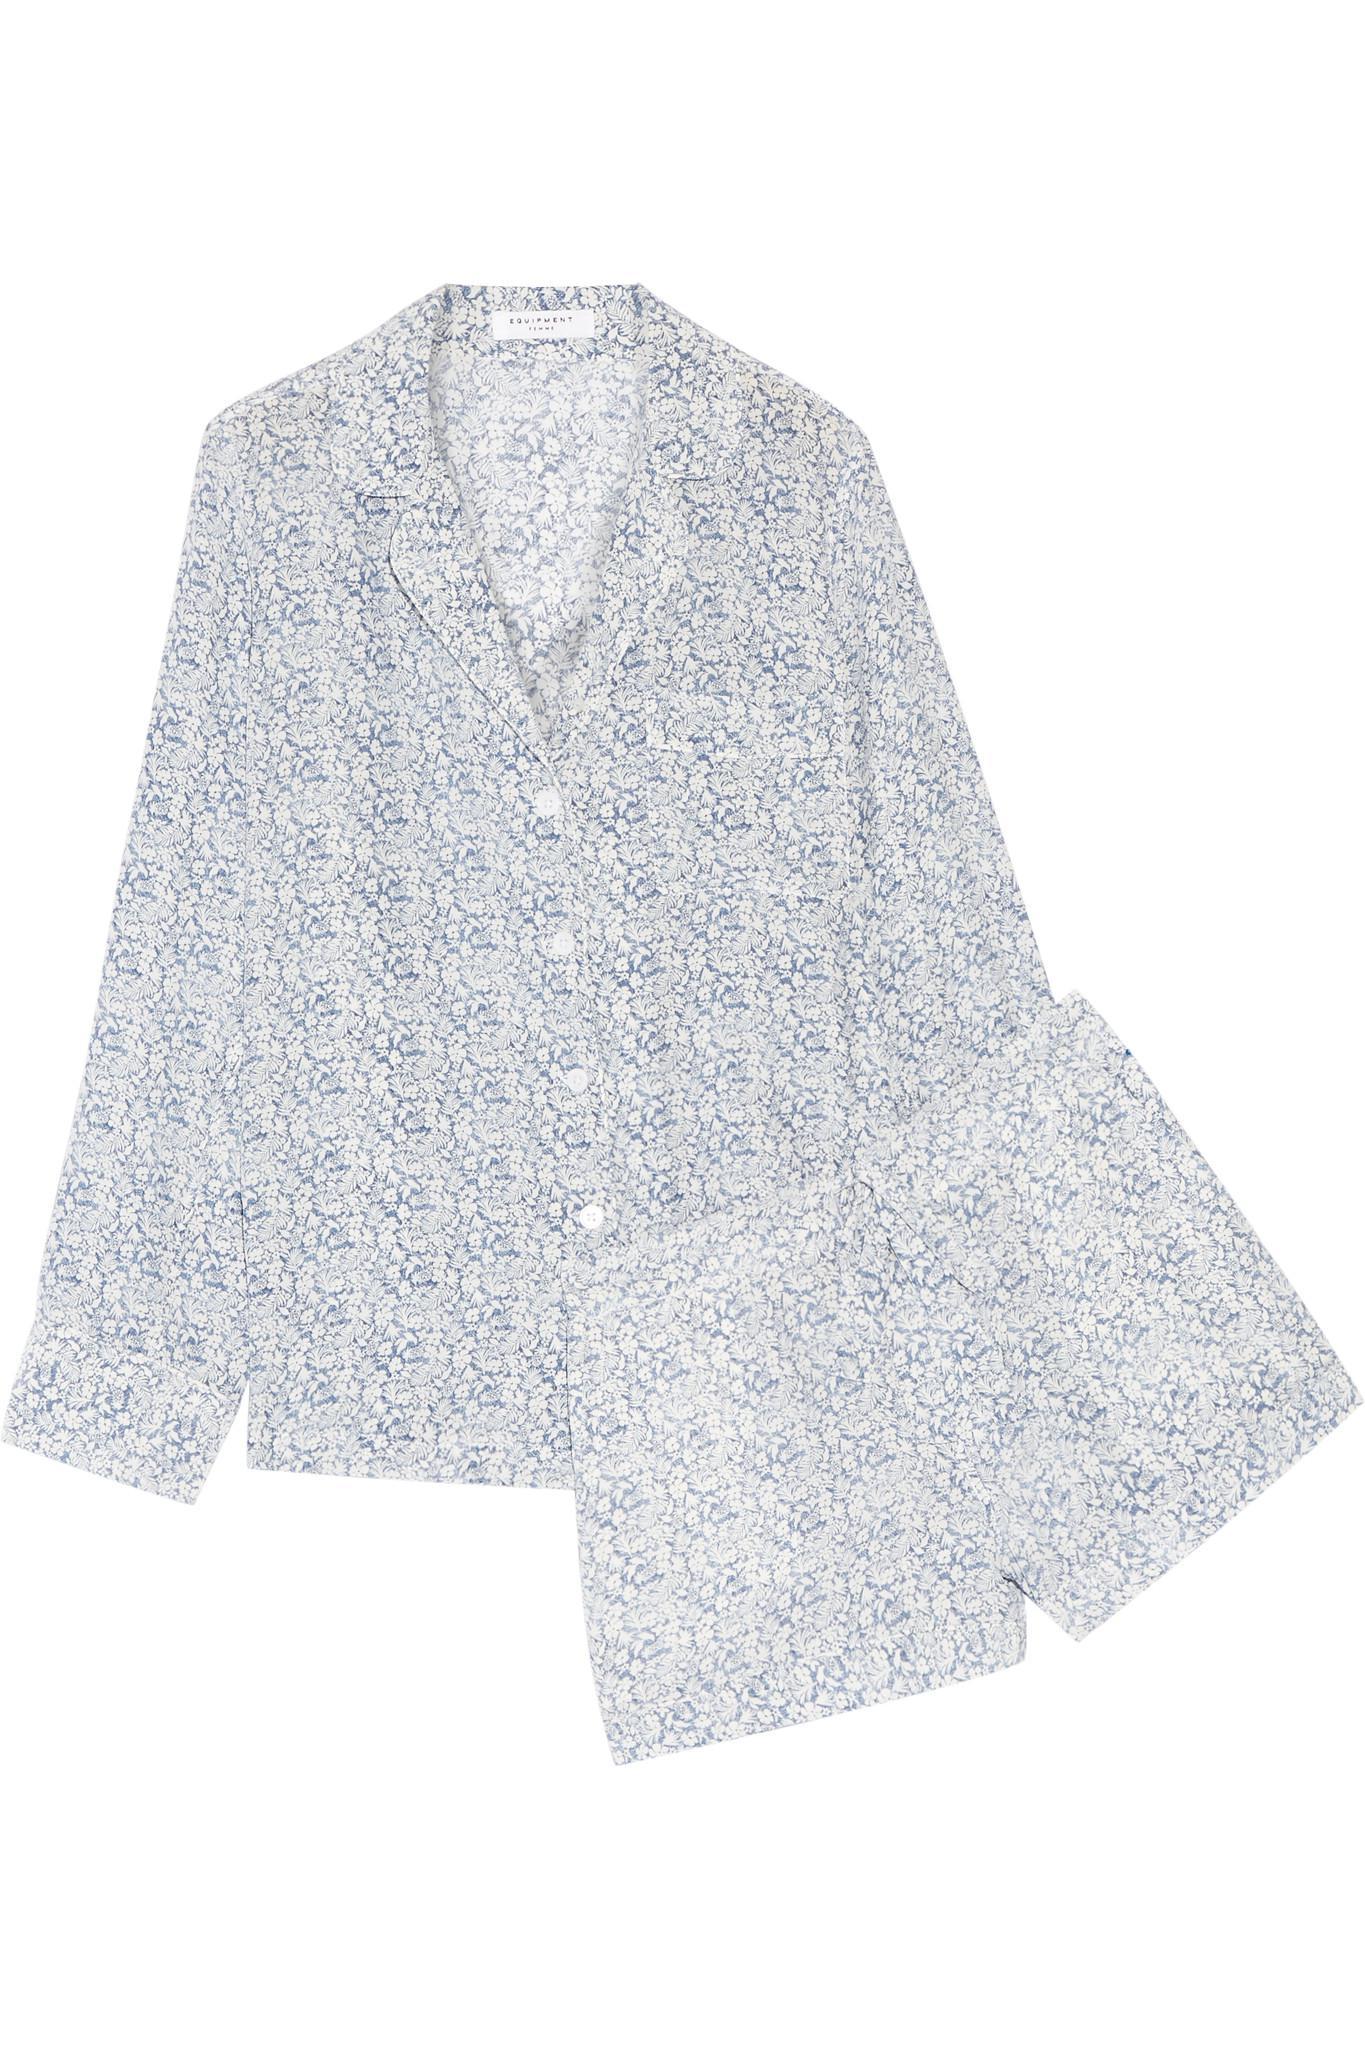 Lyst - Equipment Lilian Floral-print Washed-silk Pajama Set in Blue 5abb5c5b2